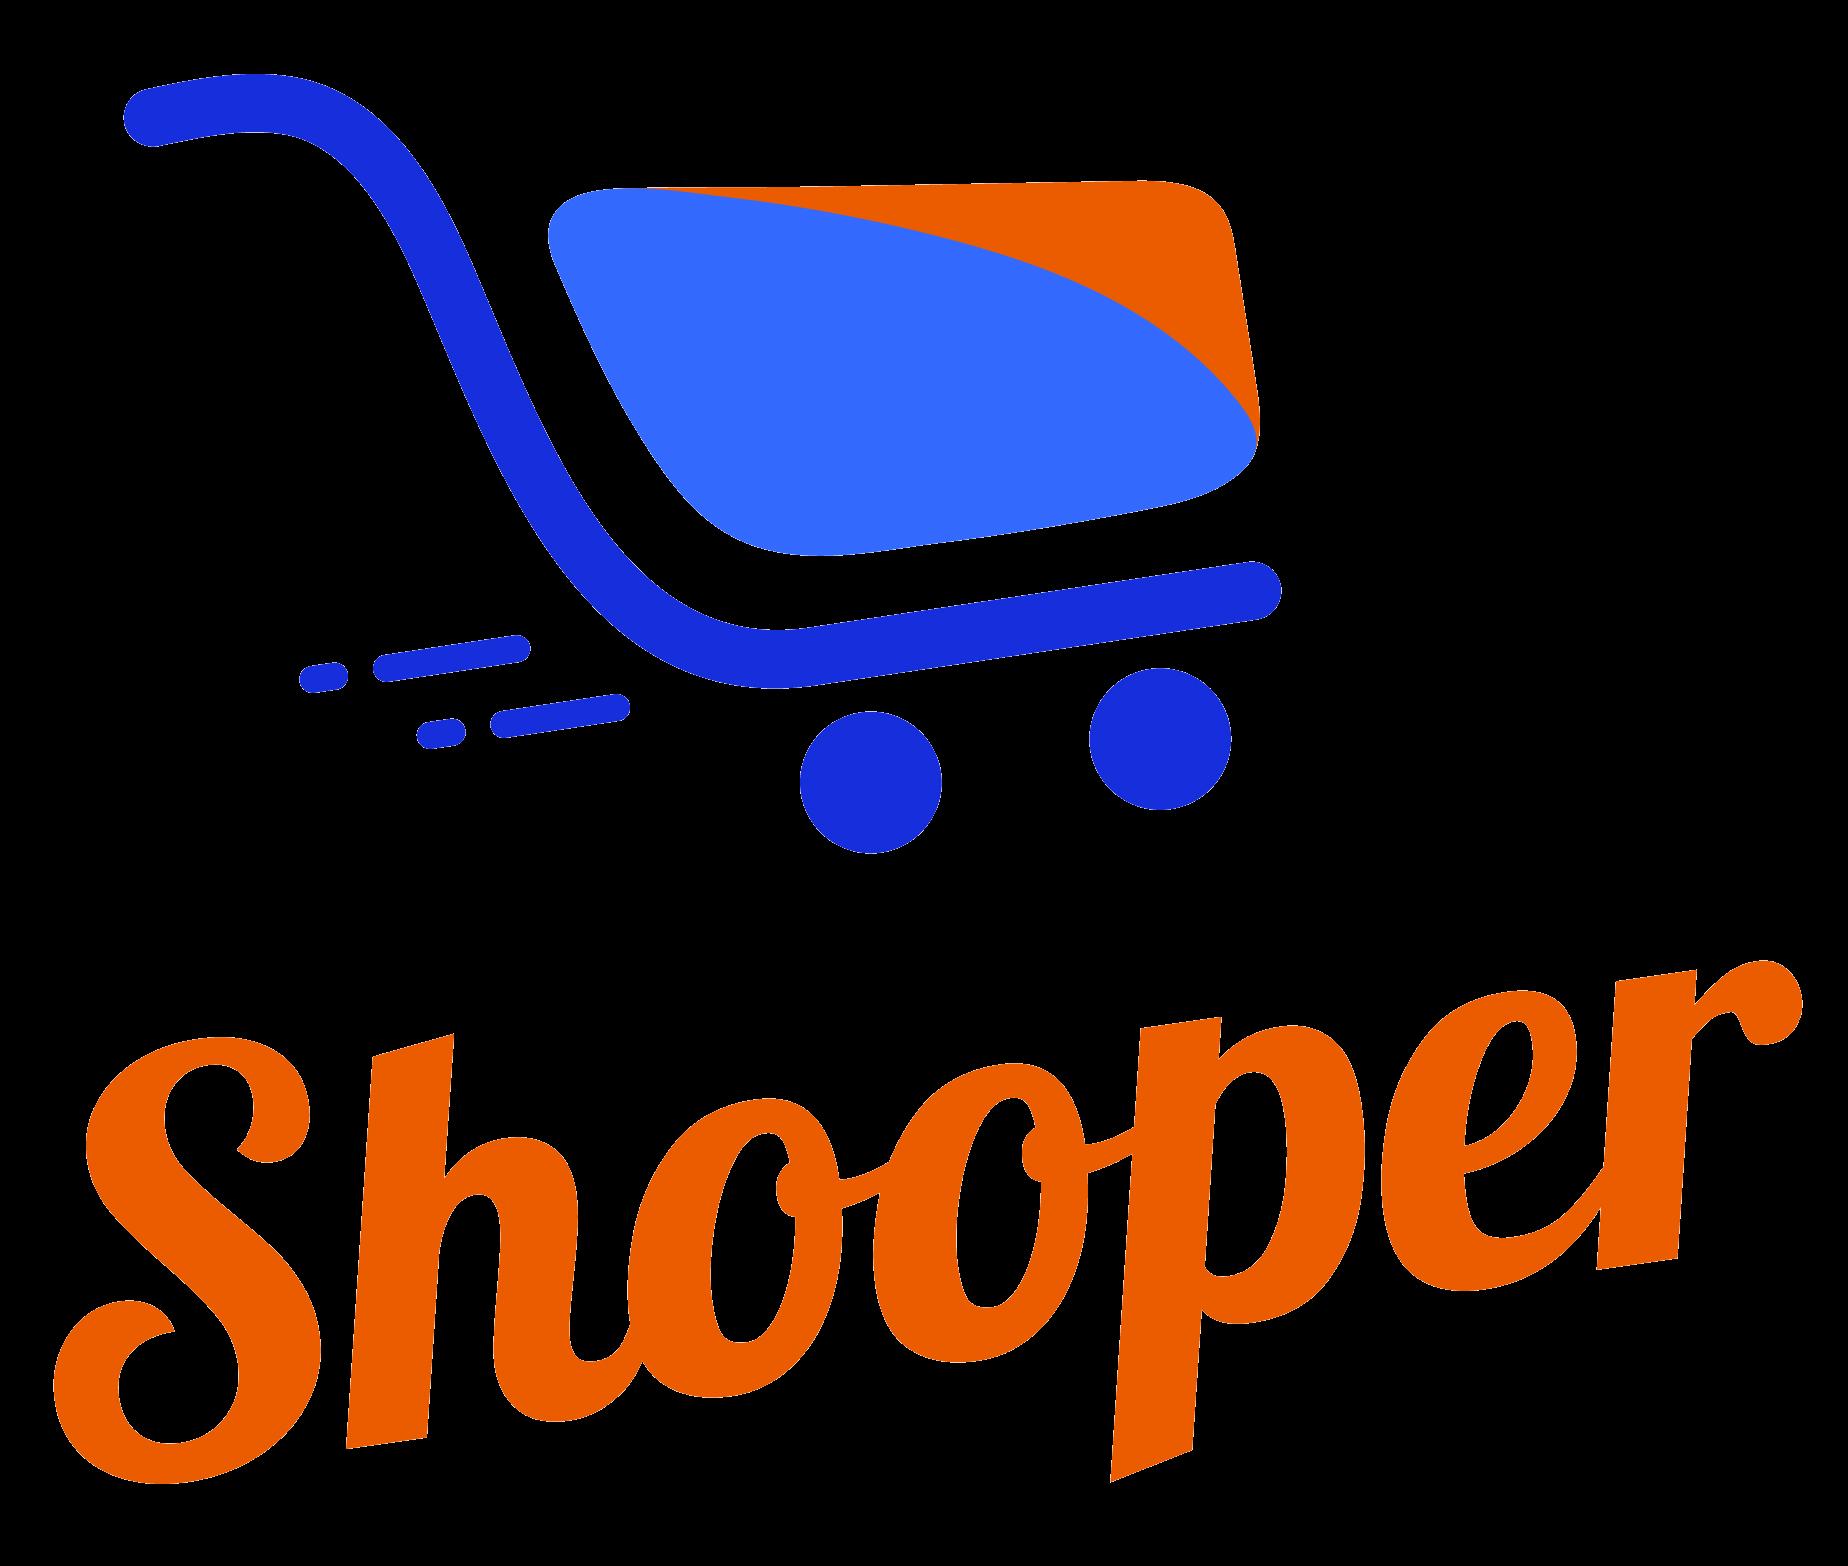 Shooper Save Money At The Supermarkets Saving Money Gaming Logos Supermarket